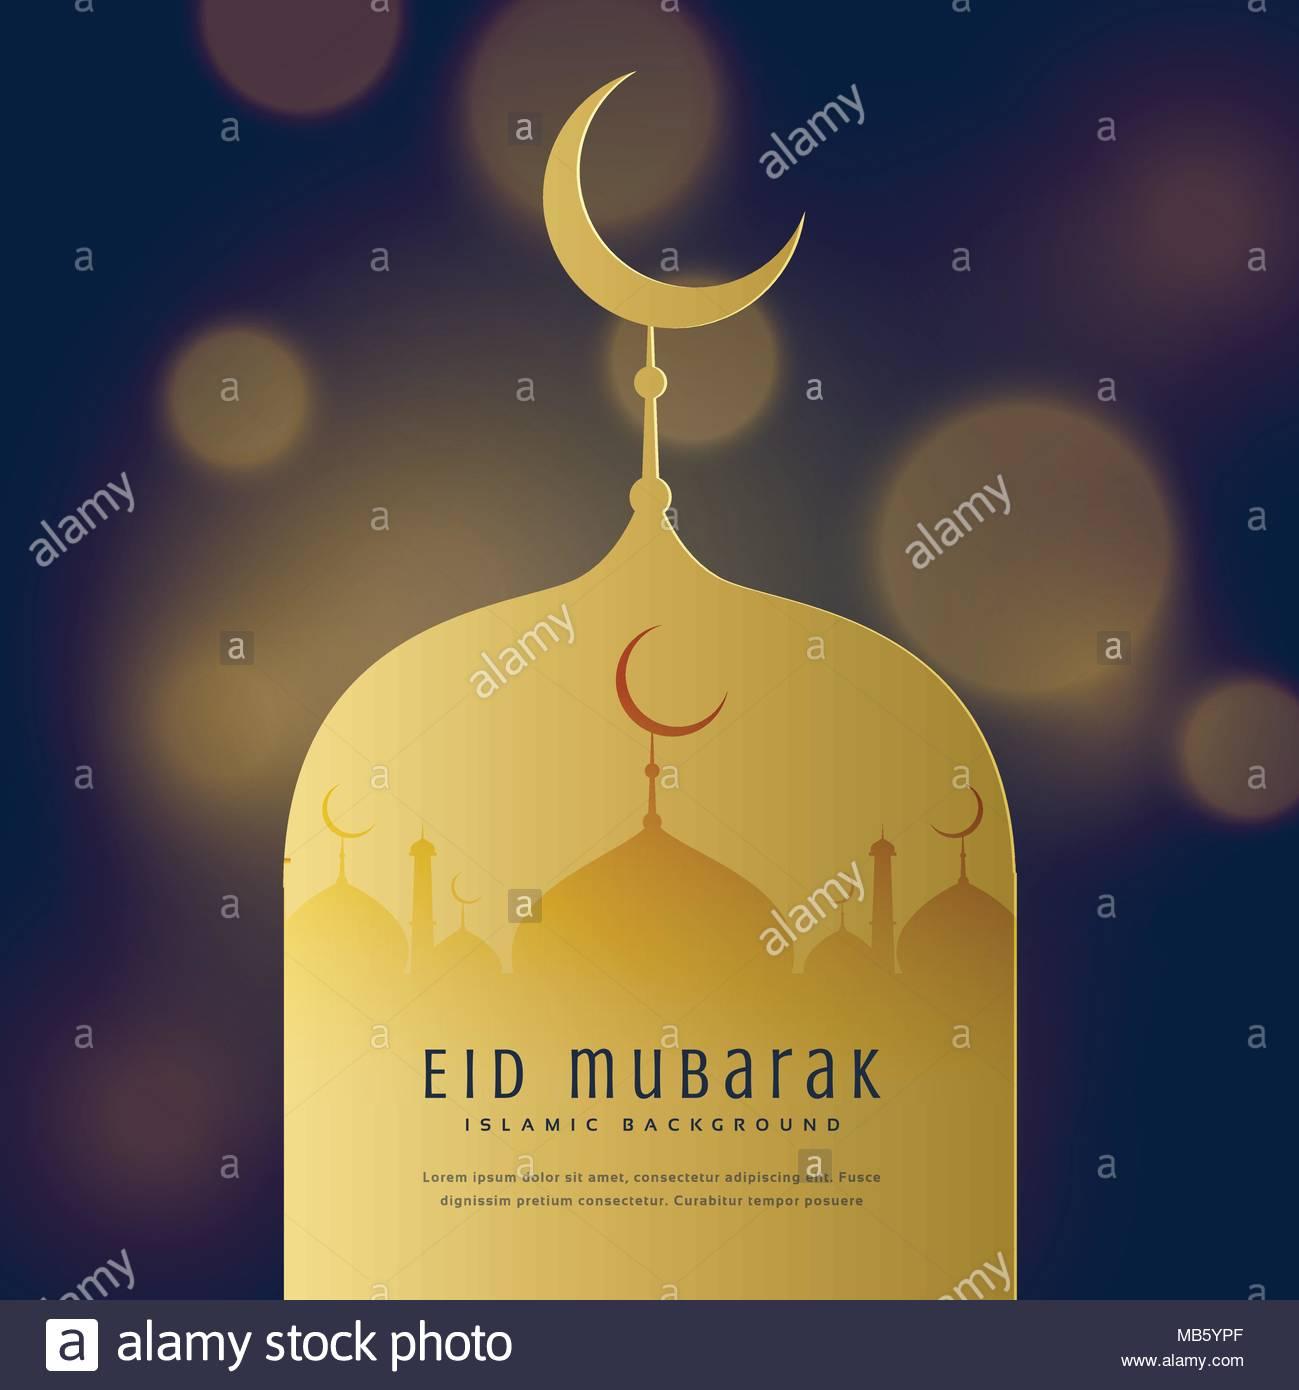 Eid mubarak greeting card design background stock vector art eid mubarak greeting card design background m4hsunfo